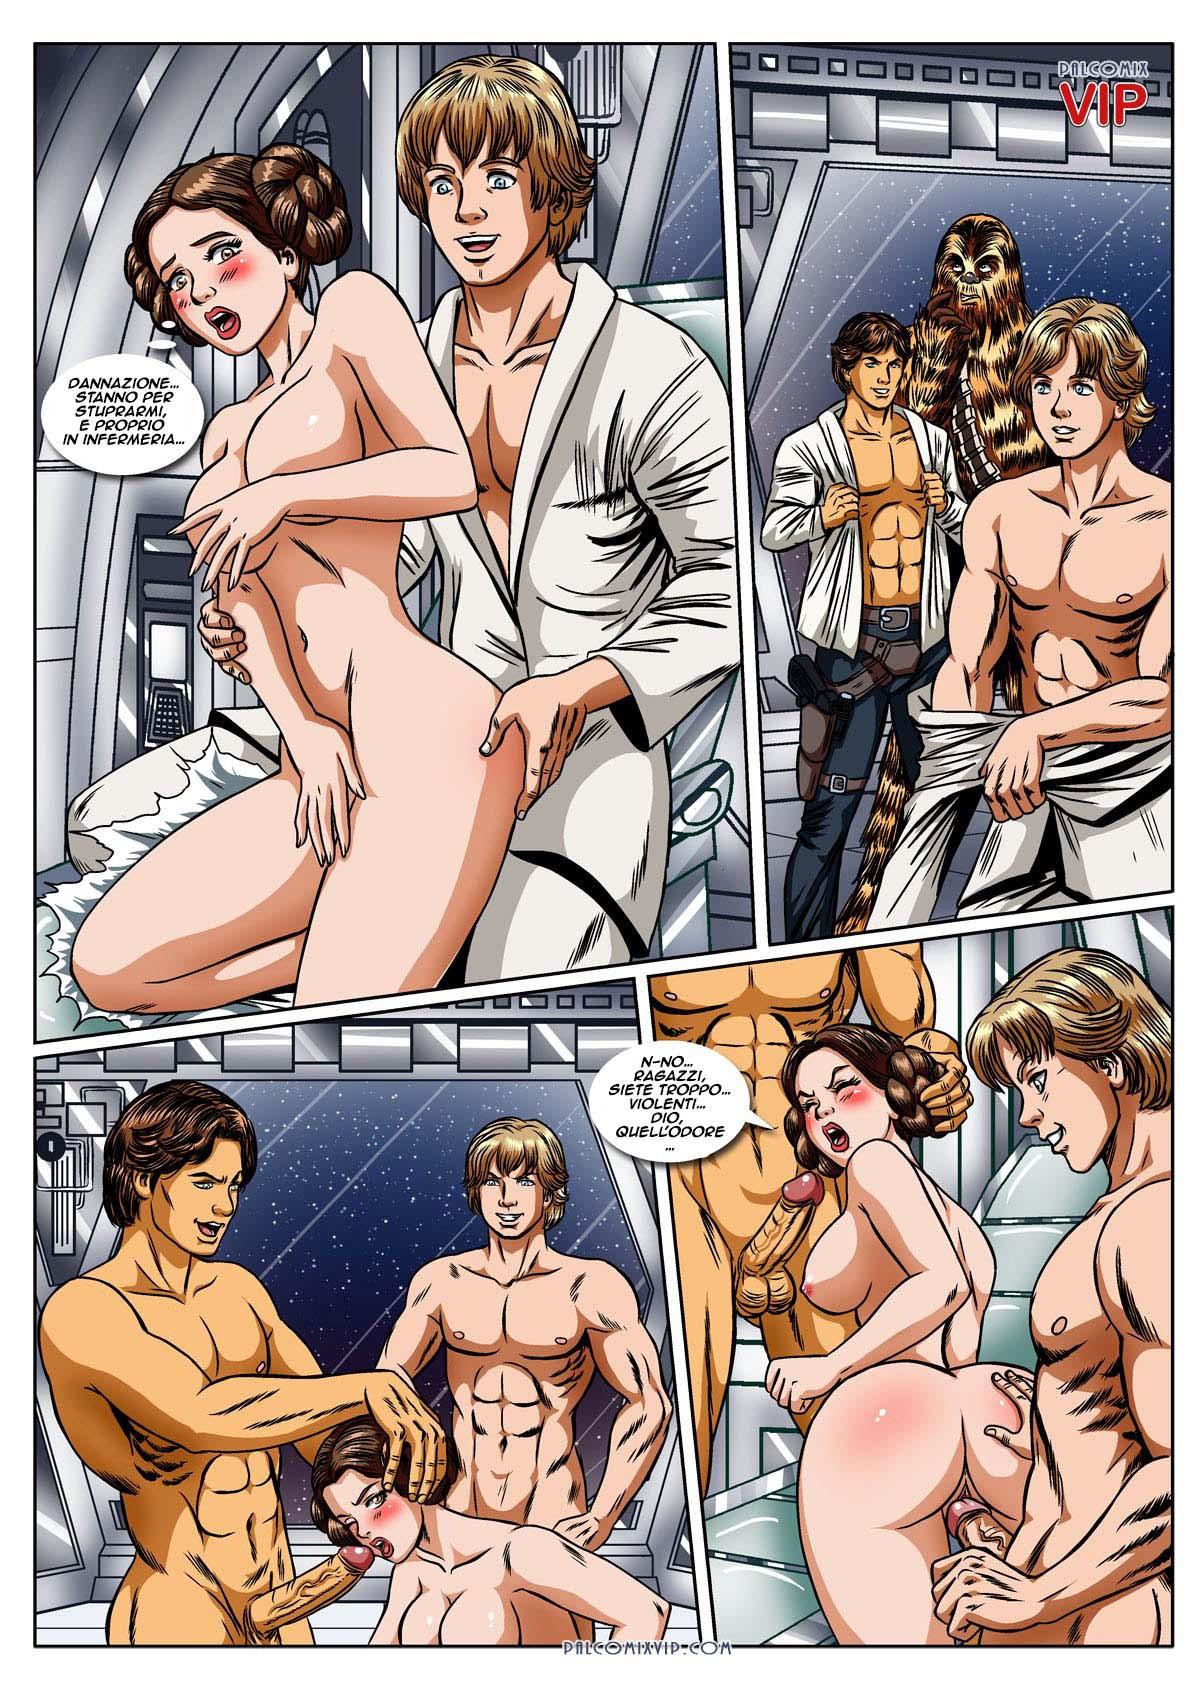 Star wars hentai archive pics 869